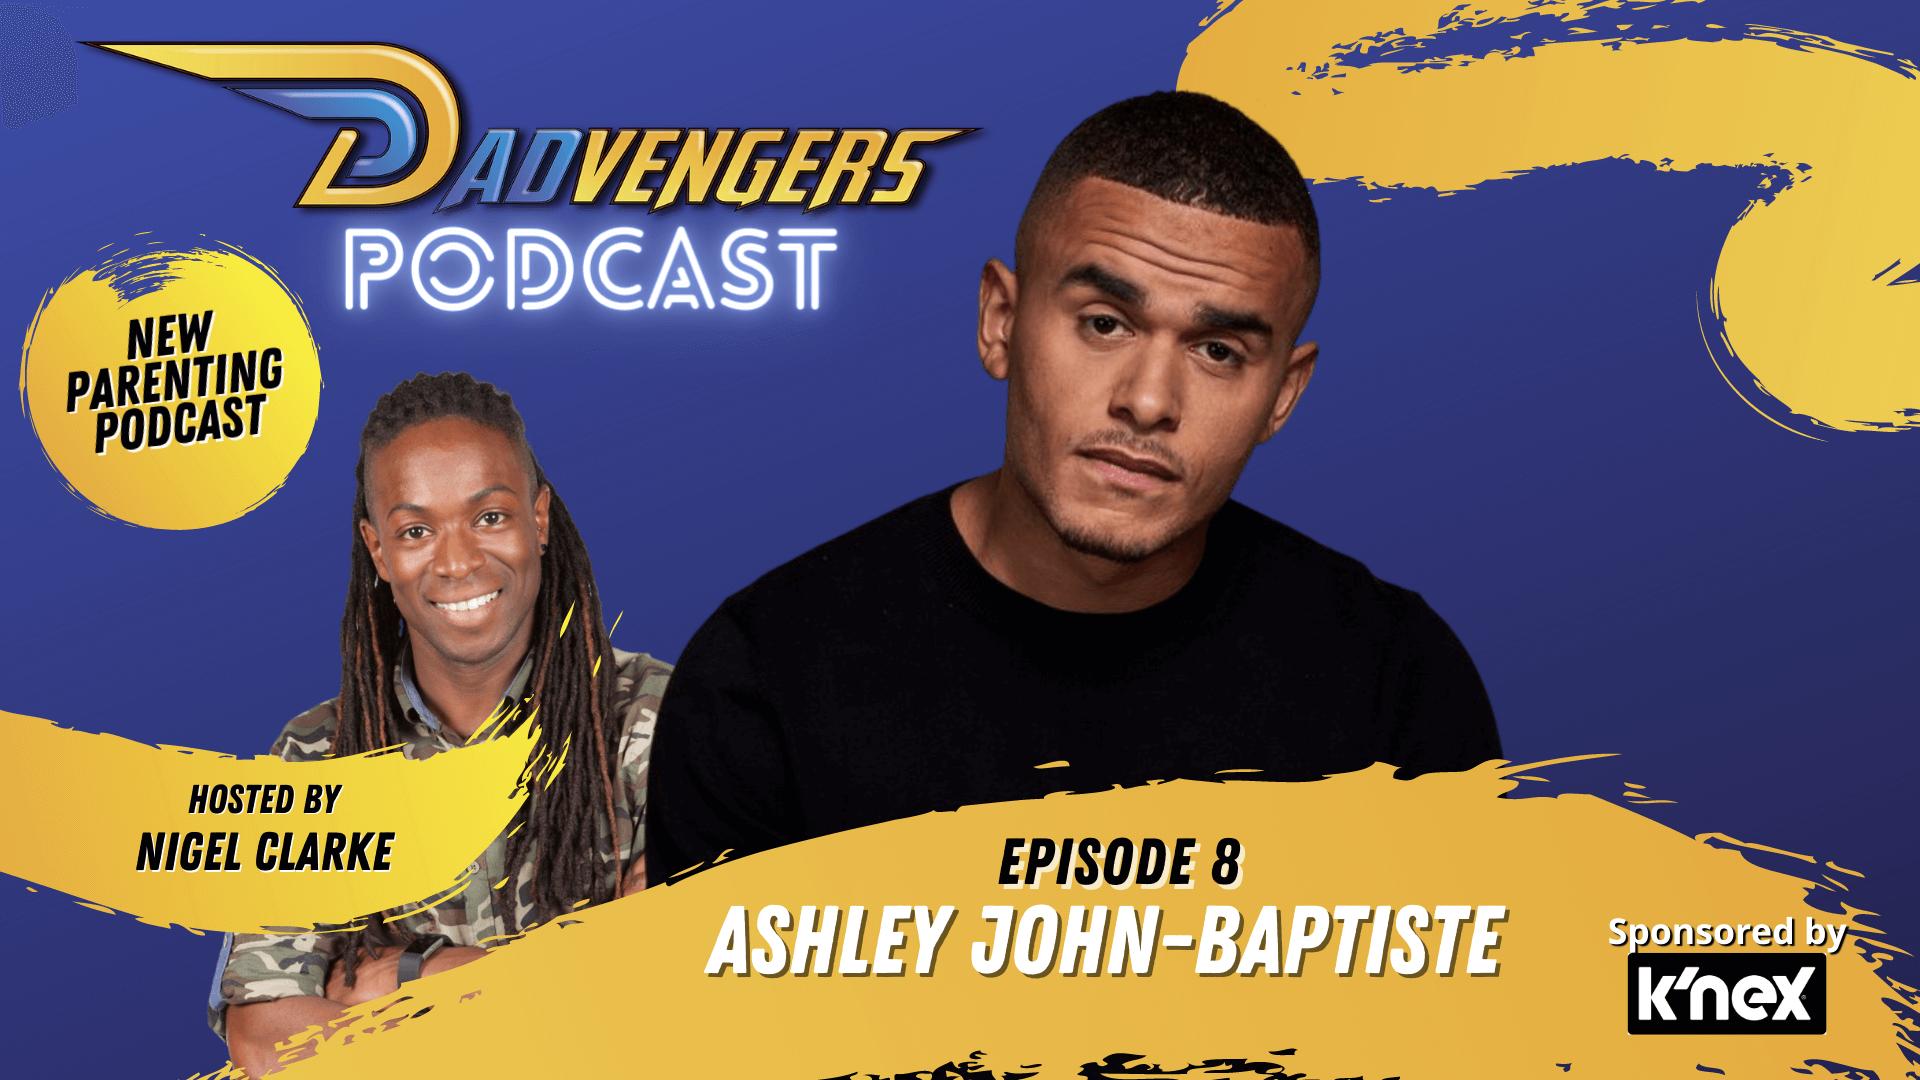 Dadvengers Podcast Episode 8 - Ashley John-Baptiste